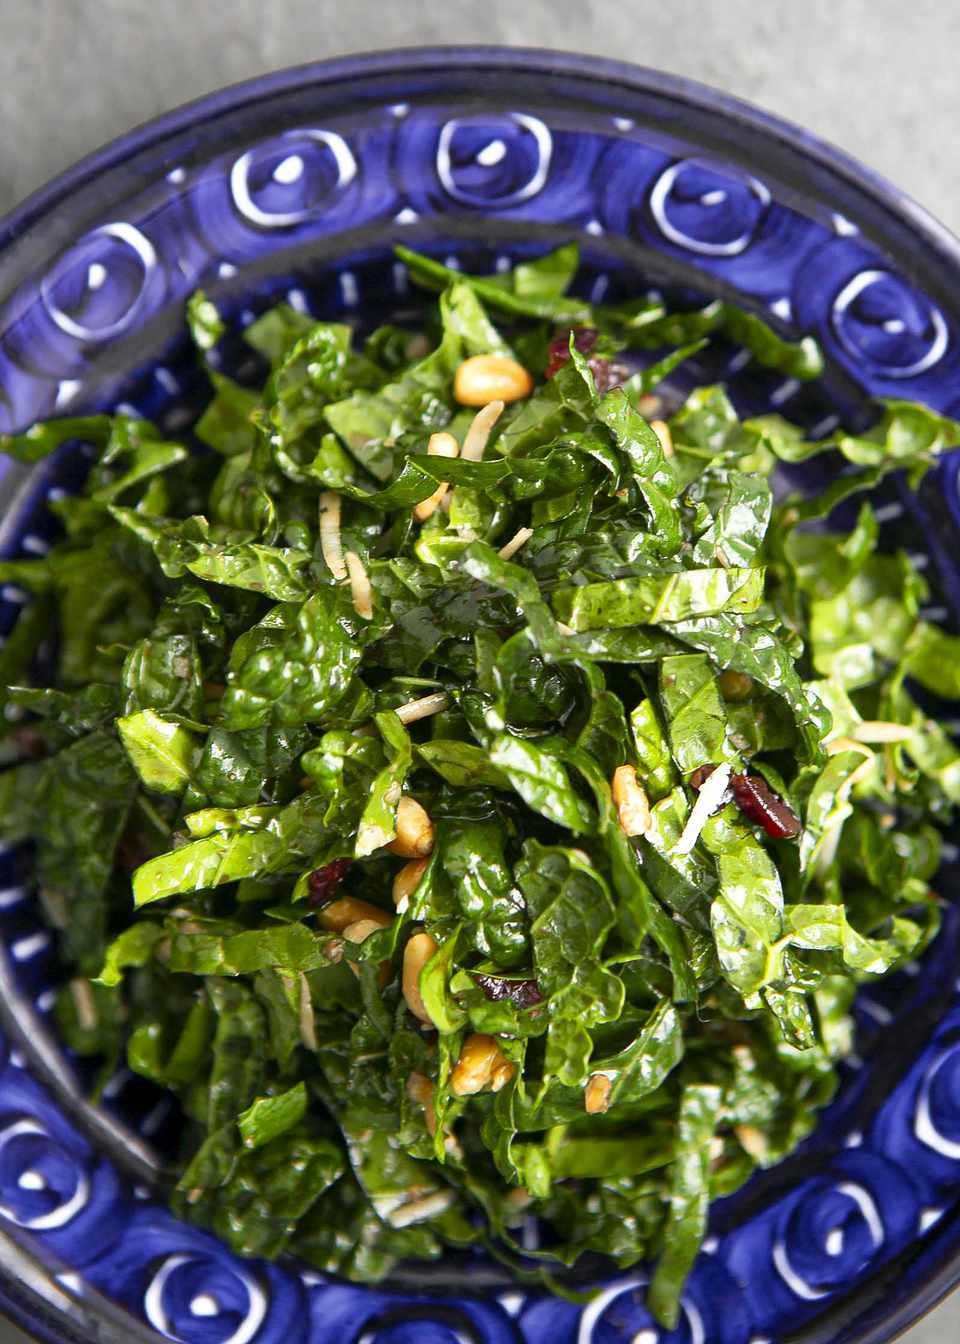 The best kale salad served in a blue bowl